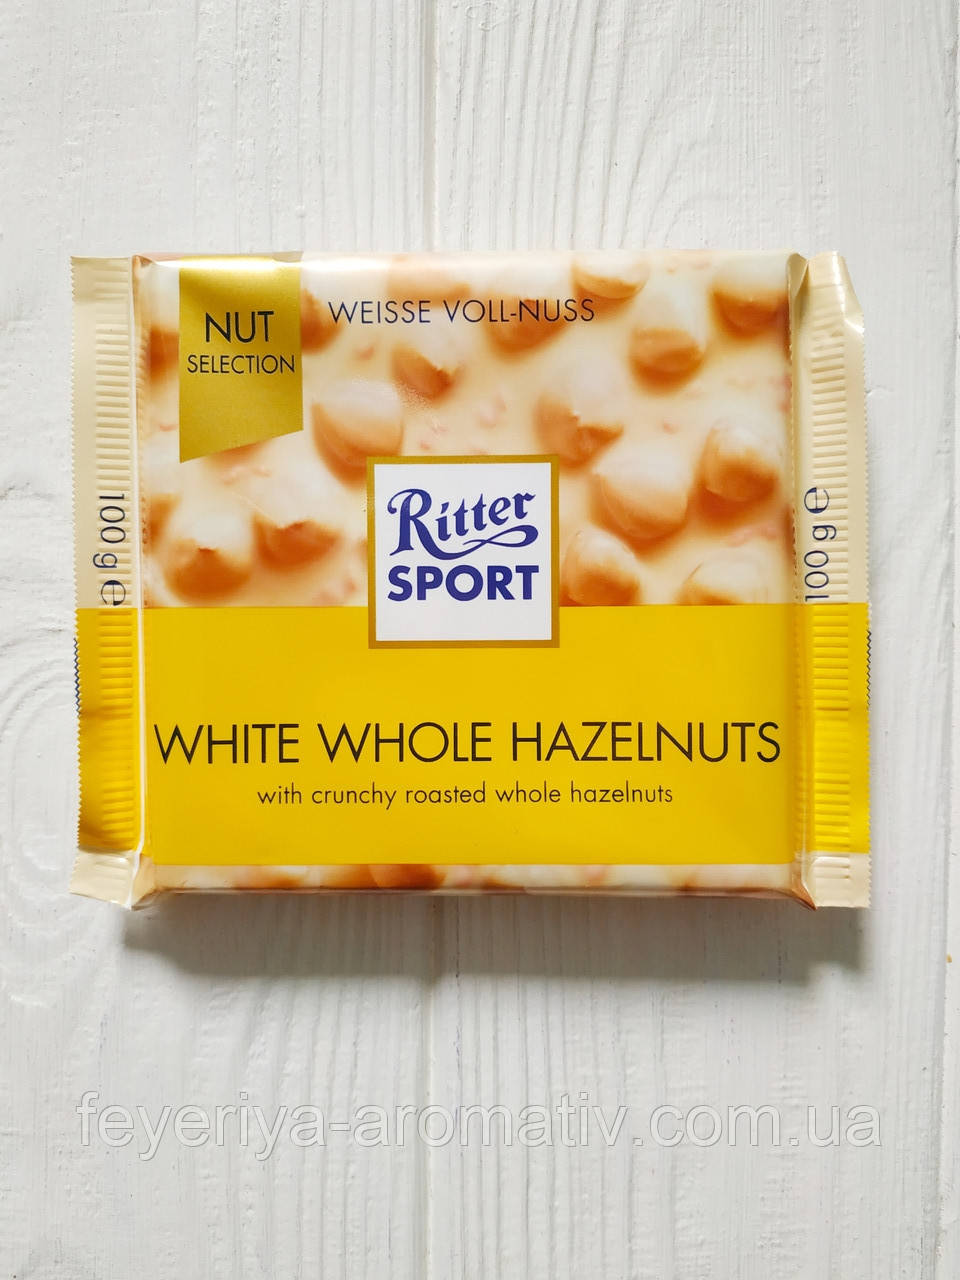 Шоколад Ritter Sport 100гр. (Германия) White Whole Hazelnuts (белый с цельным фундуком)